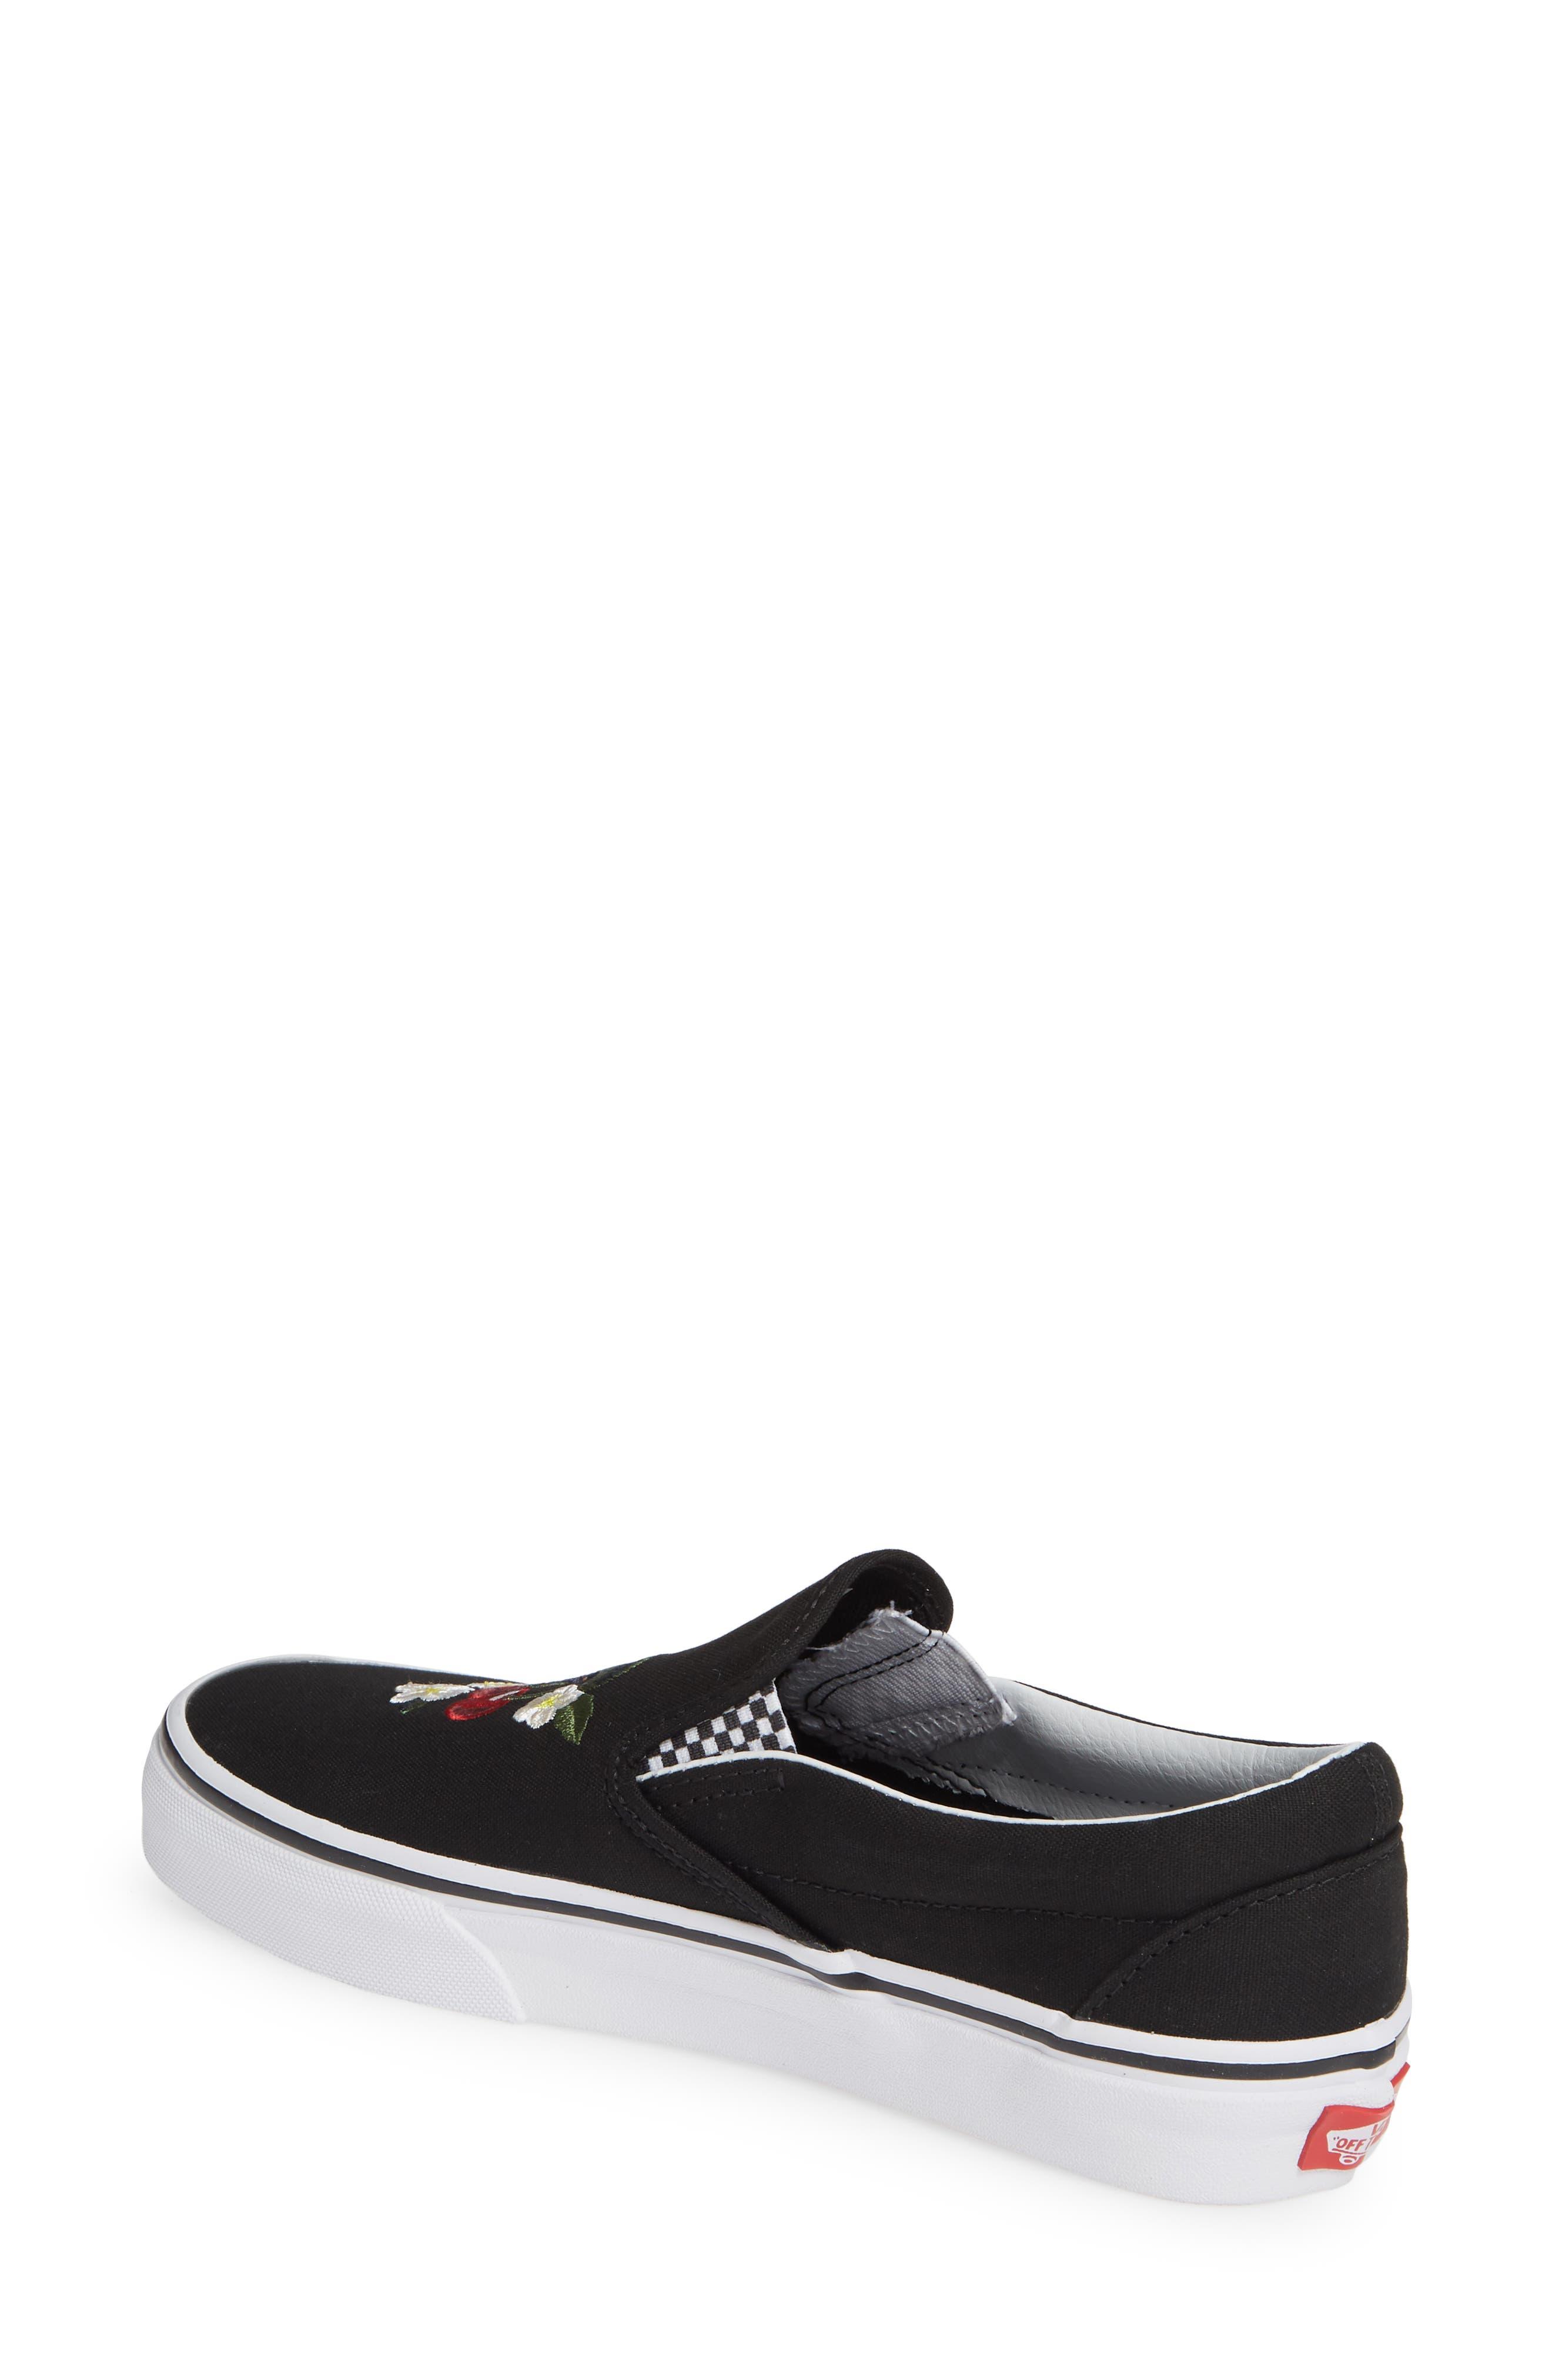 Classic Slip-On Sneaker,                             Alternate thumbnail 2, color,                             CHECKER FLORAL BLACK